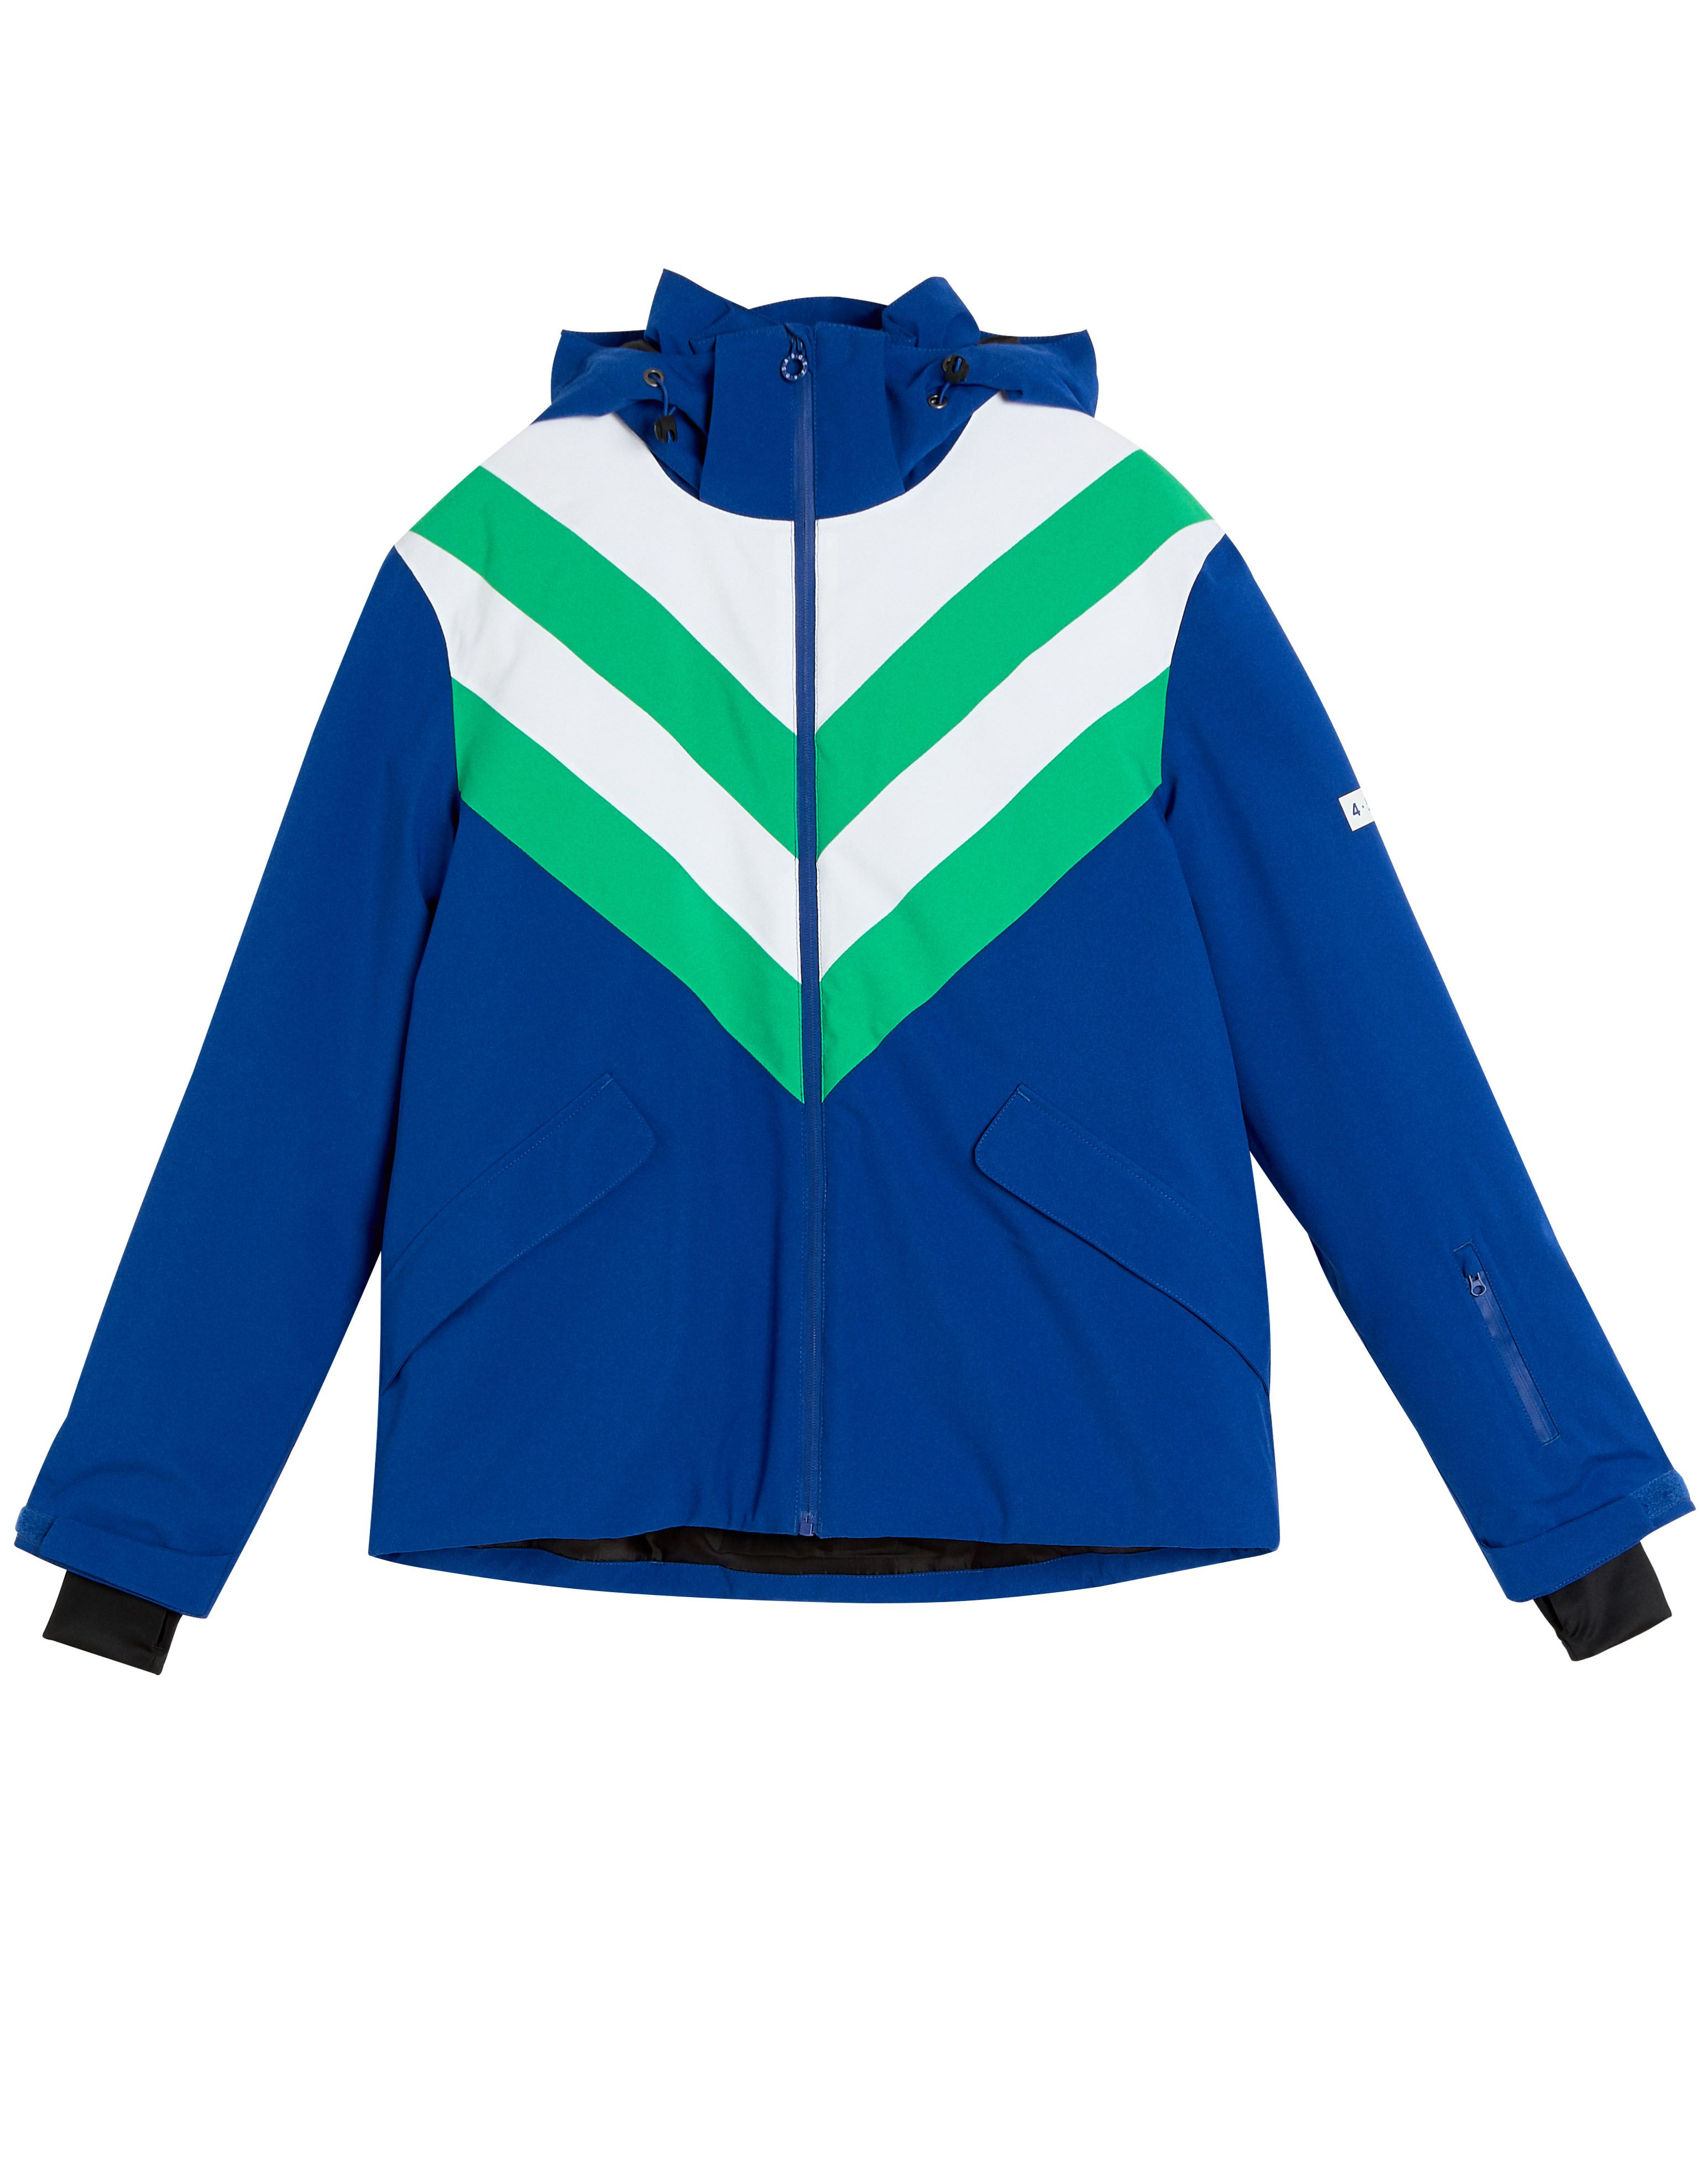 7773e4c1af65c9 ASOS 4505 - ASOS sportswear now exists